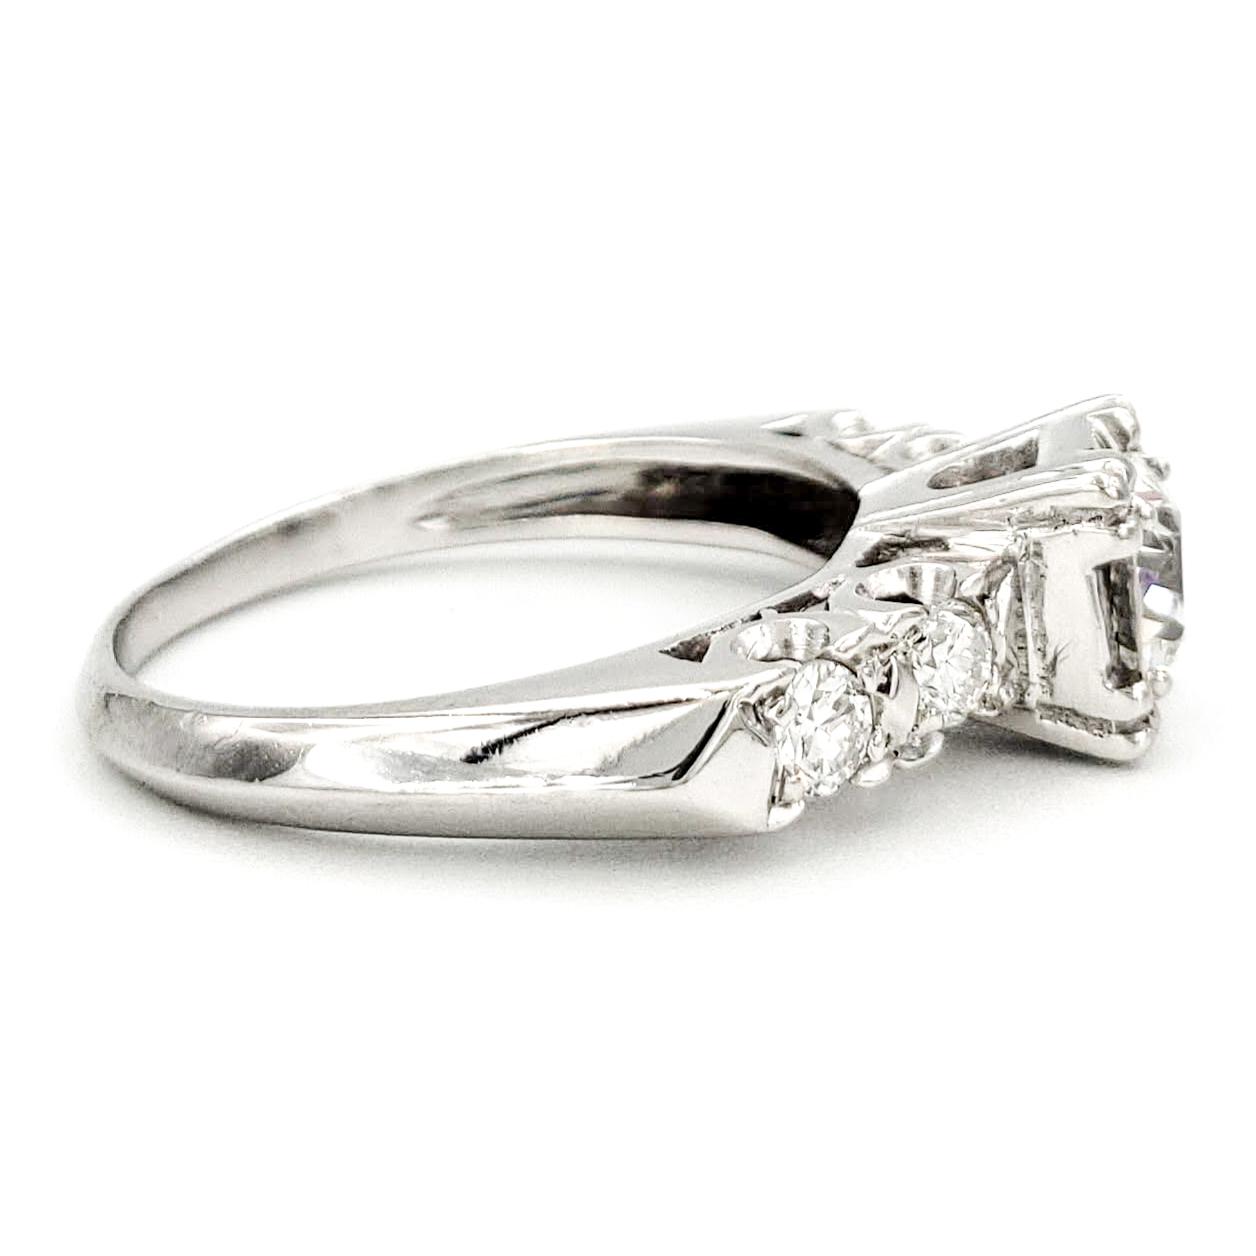 vintage-platinum-engagement-ring-with-0-49-carat-old-european-cut-diamond-egl-e-vs1